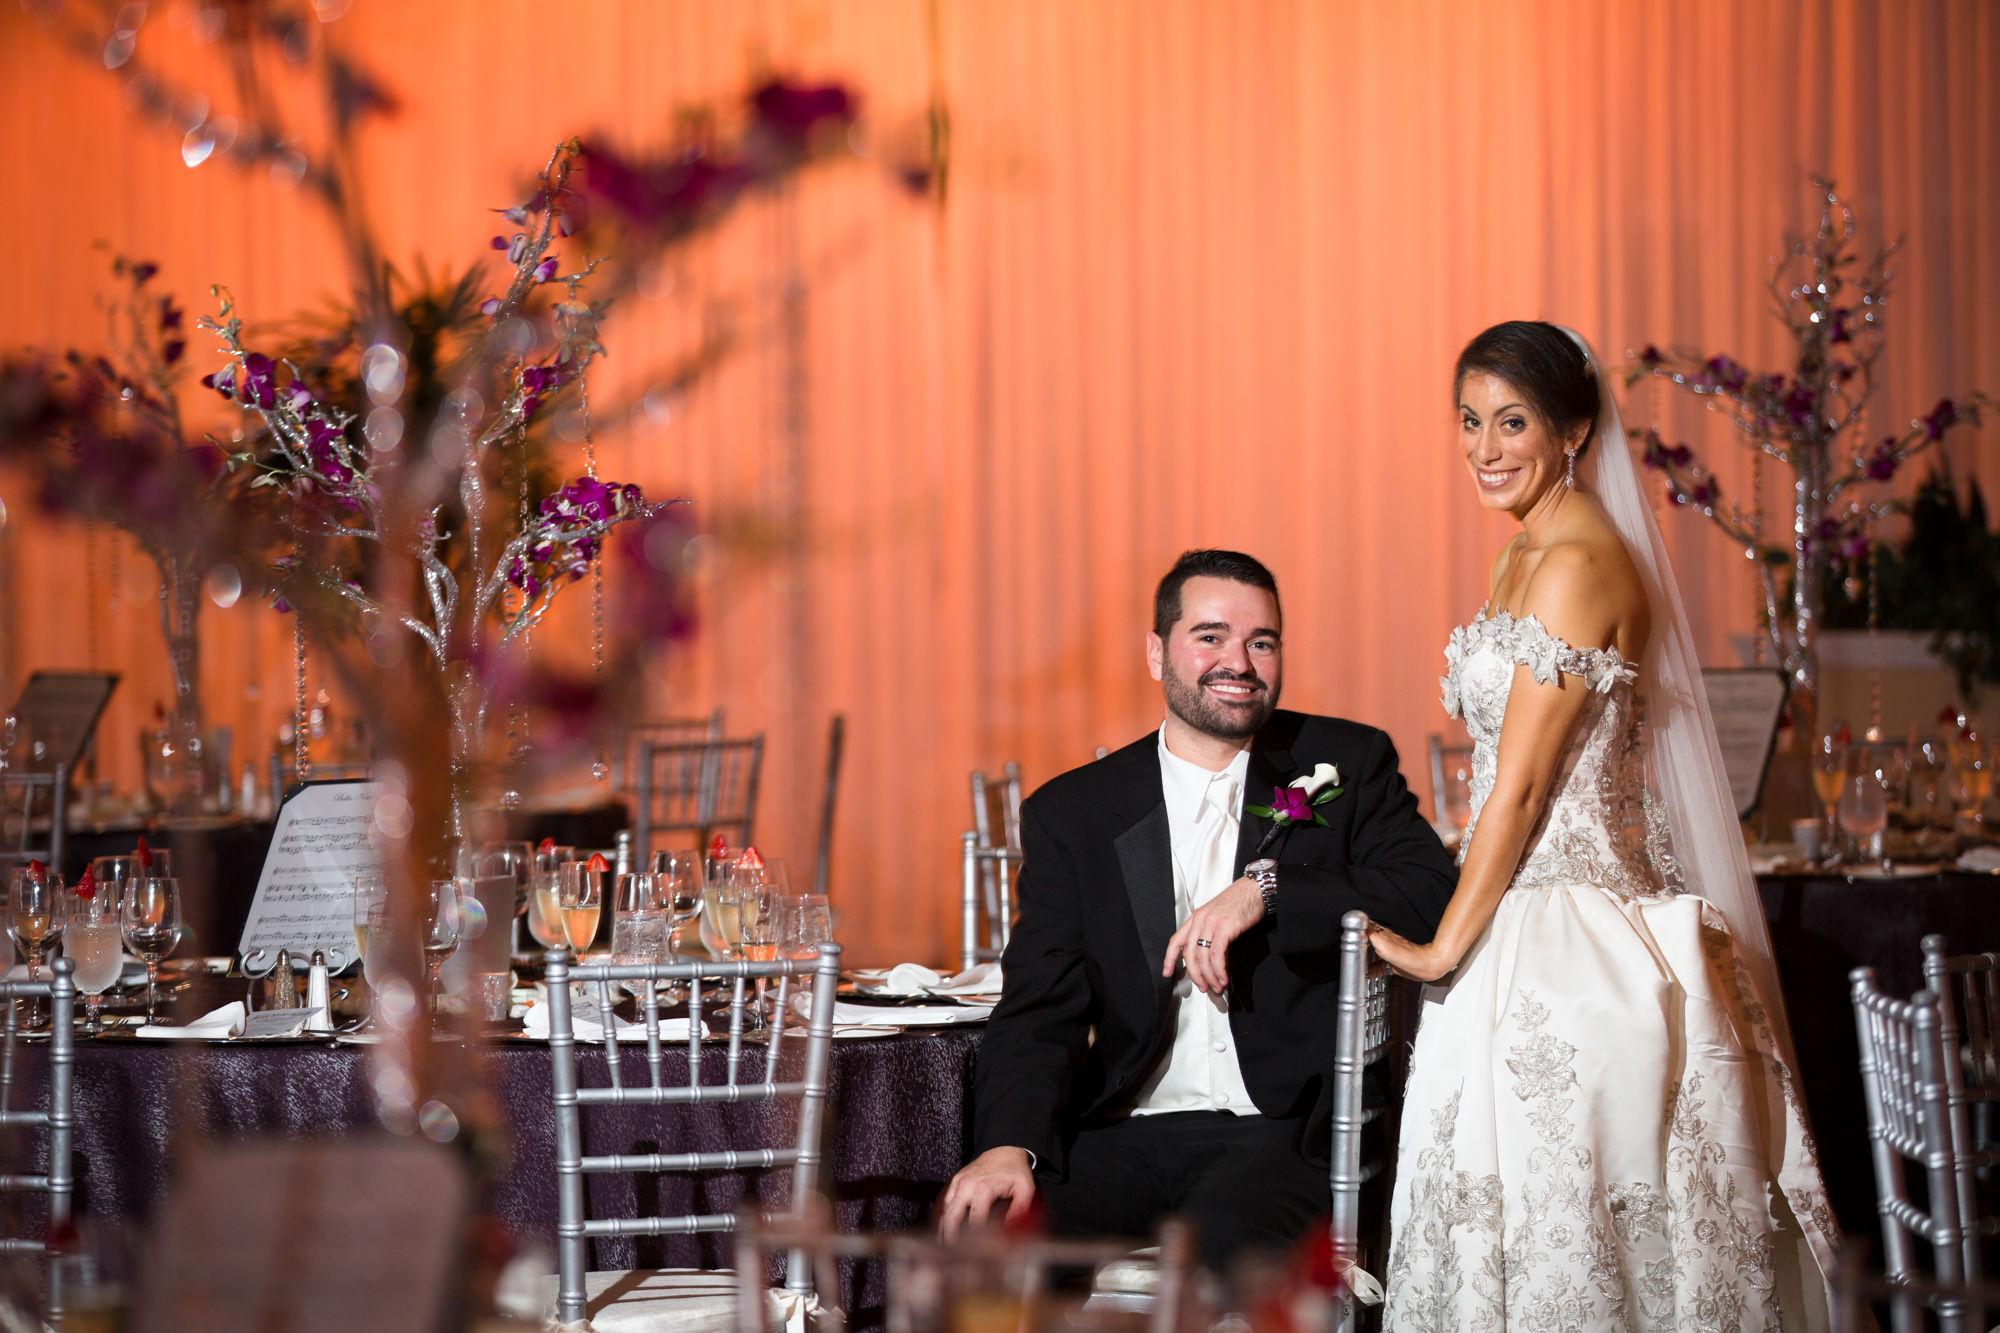 Benvenuto_Wedding_catholic_Florida_Bride-Groom-102.jpg